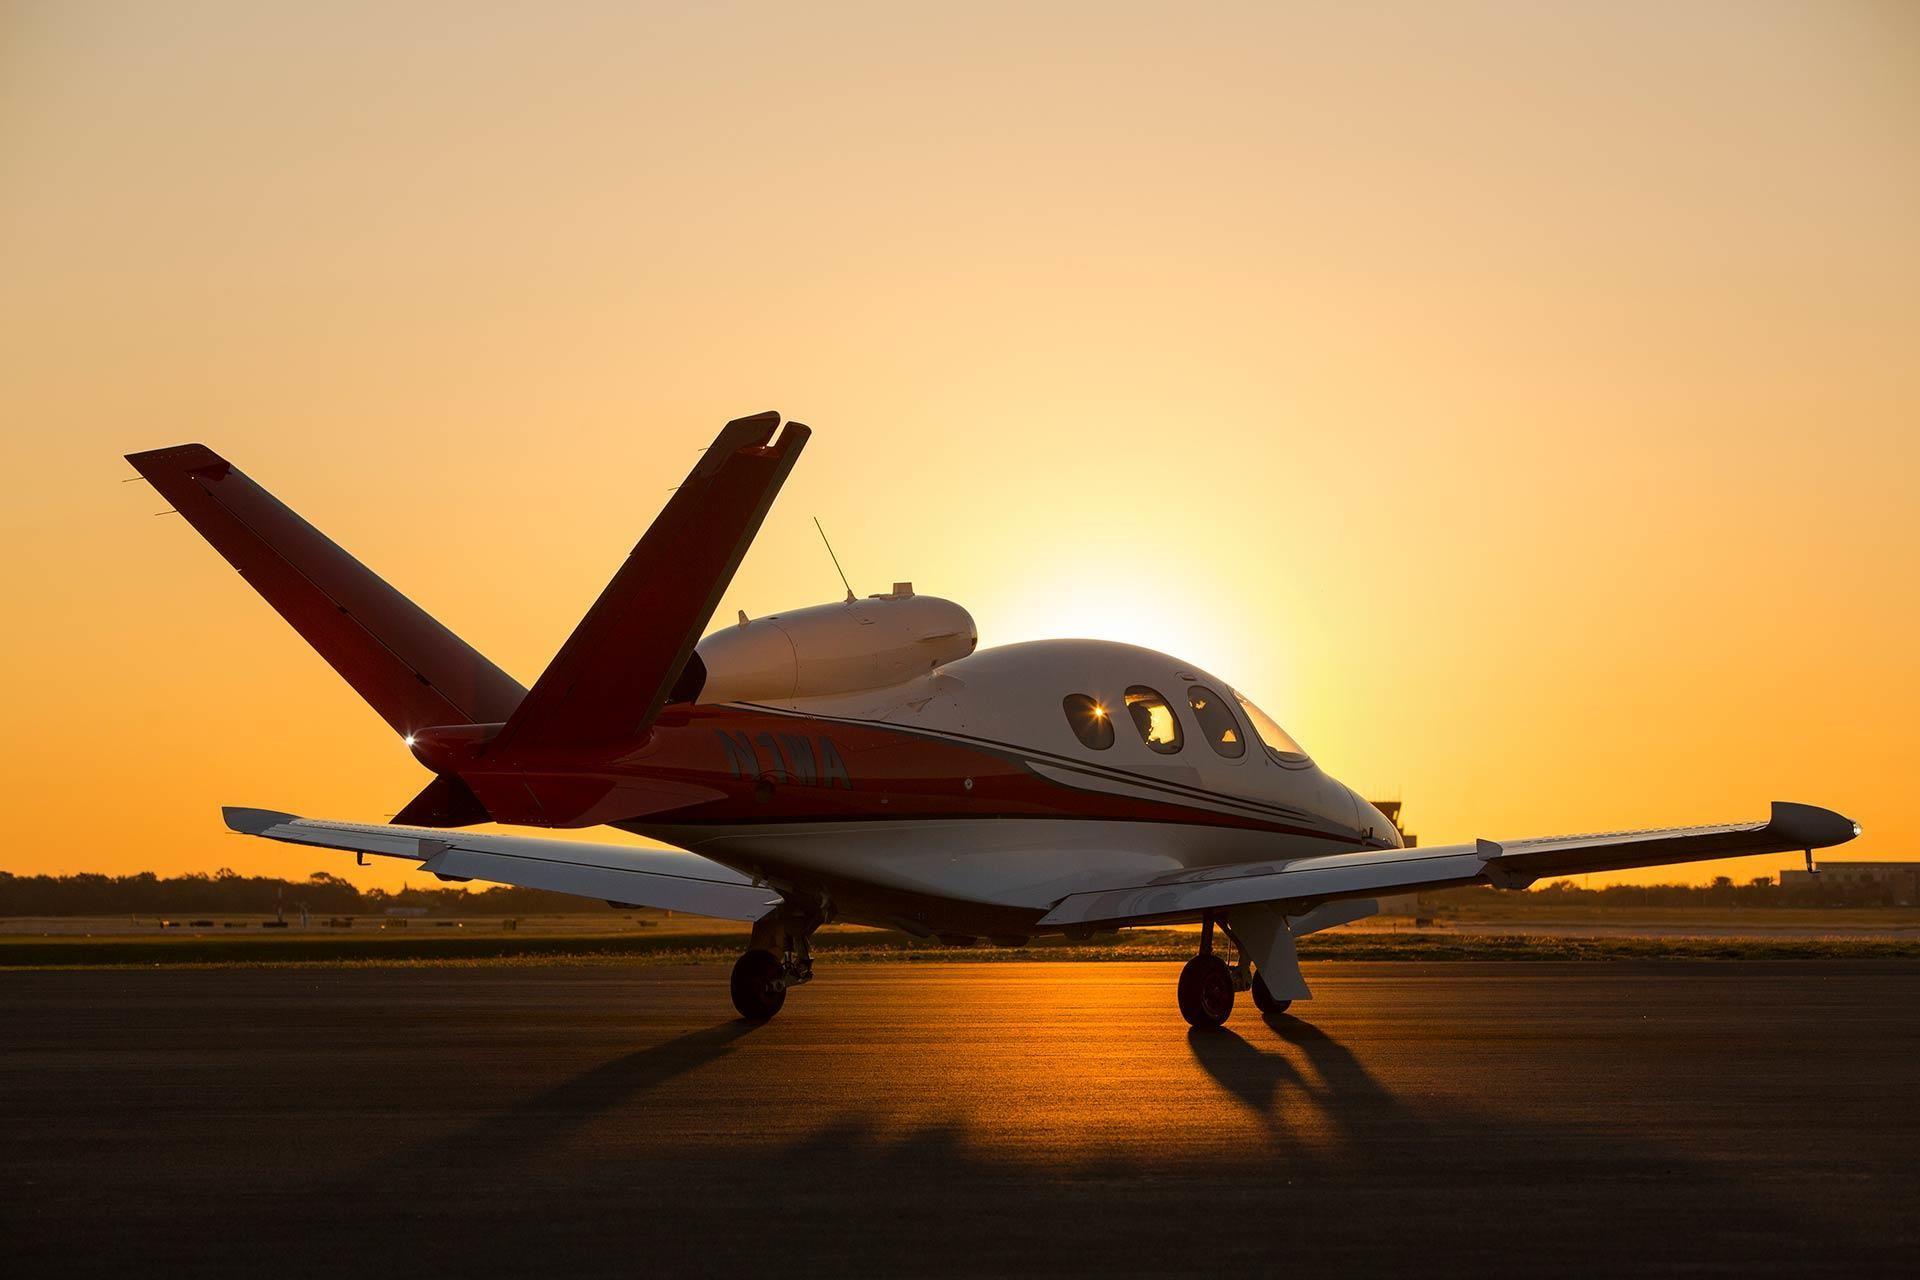 Med en pris på under 2 millioner dollar, er Cirrus Visions Jet det billigste jetflyet du kan kjøpe.